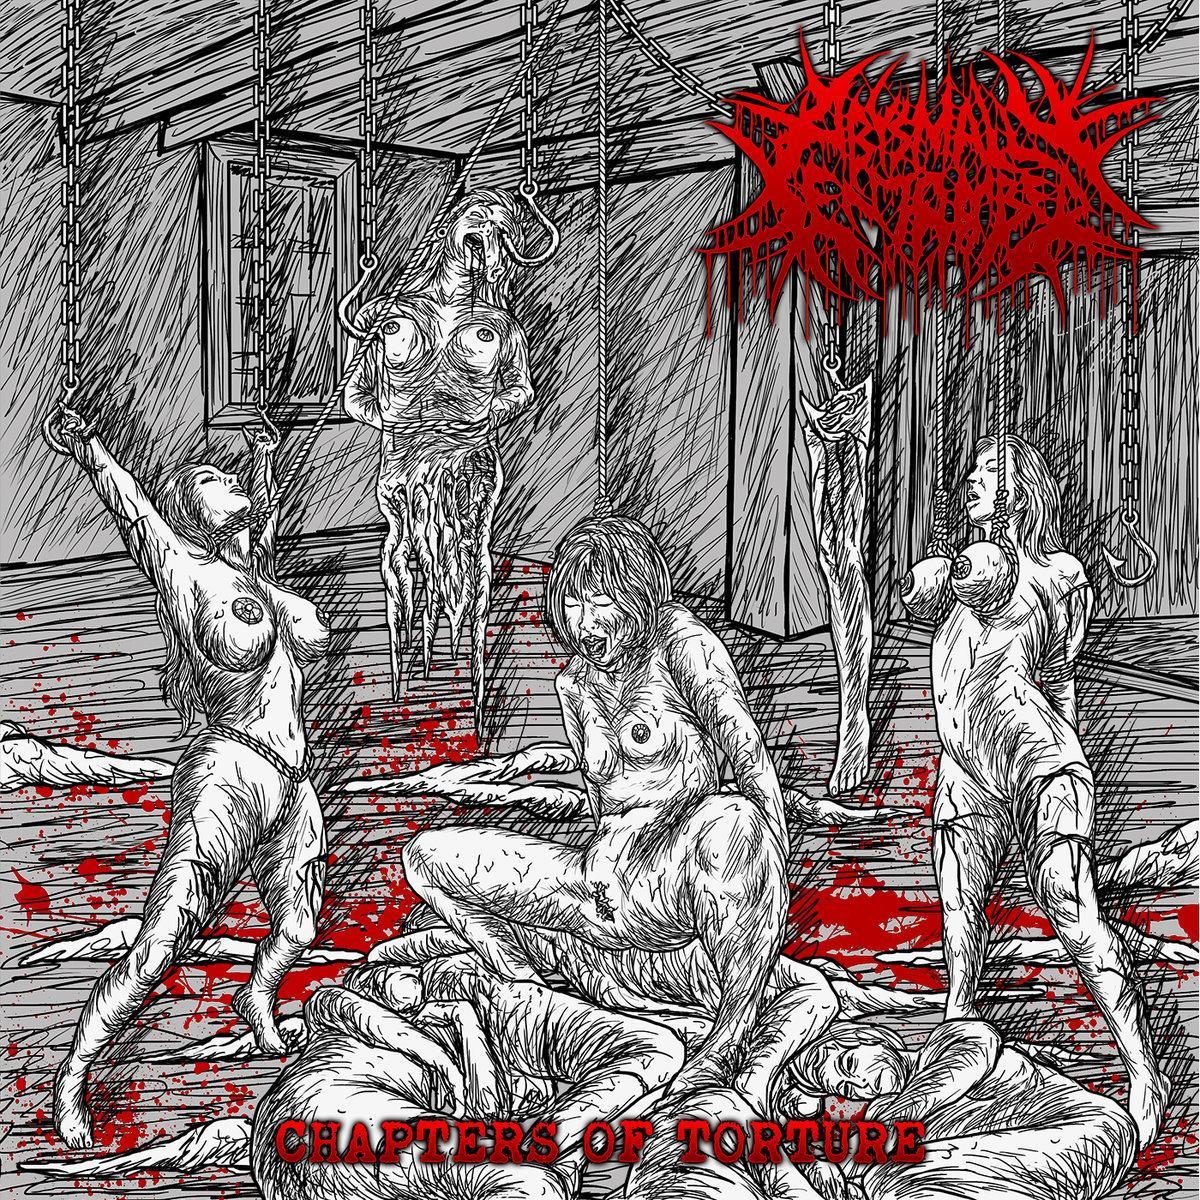 Anus death metal, naked strip tease hot girl